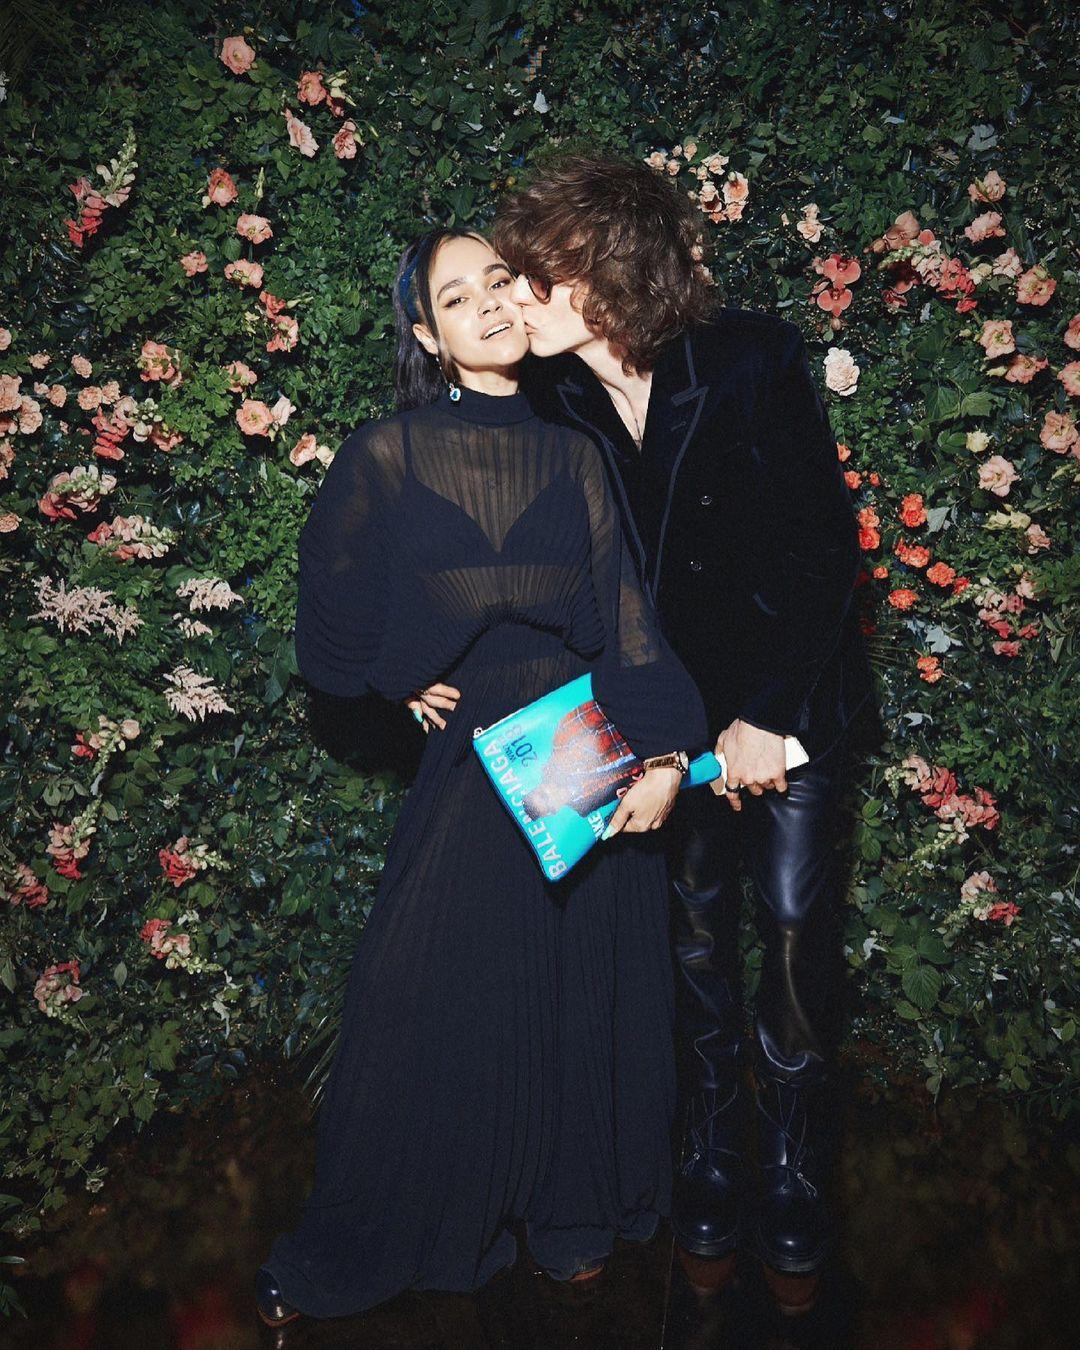 Ирина Смелая и Даниил Патлах (фото: @smelaya_ira)